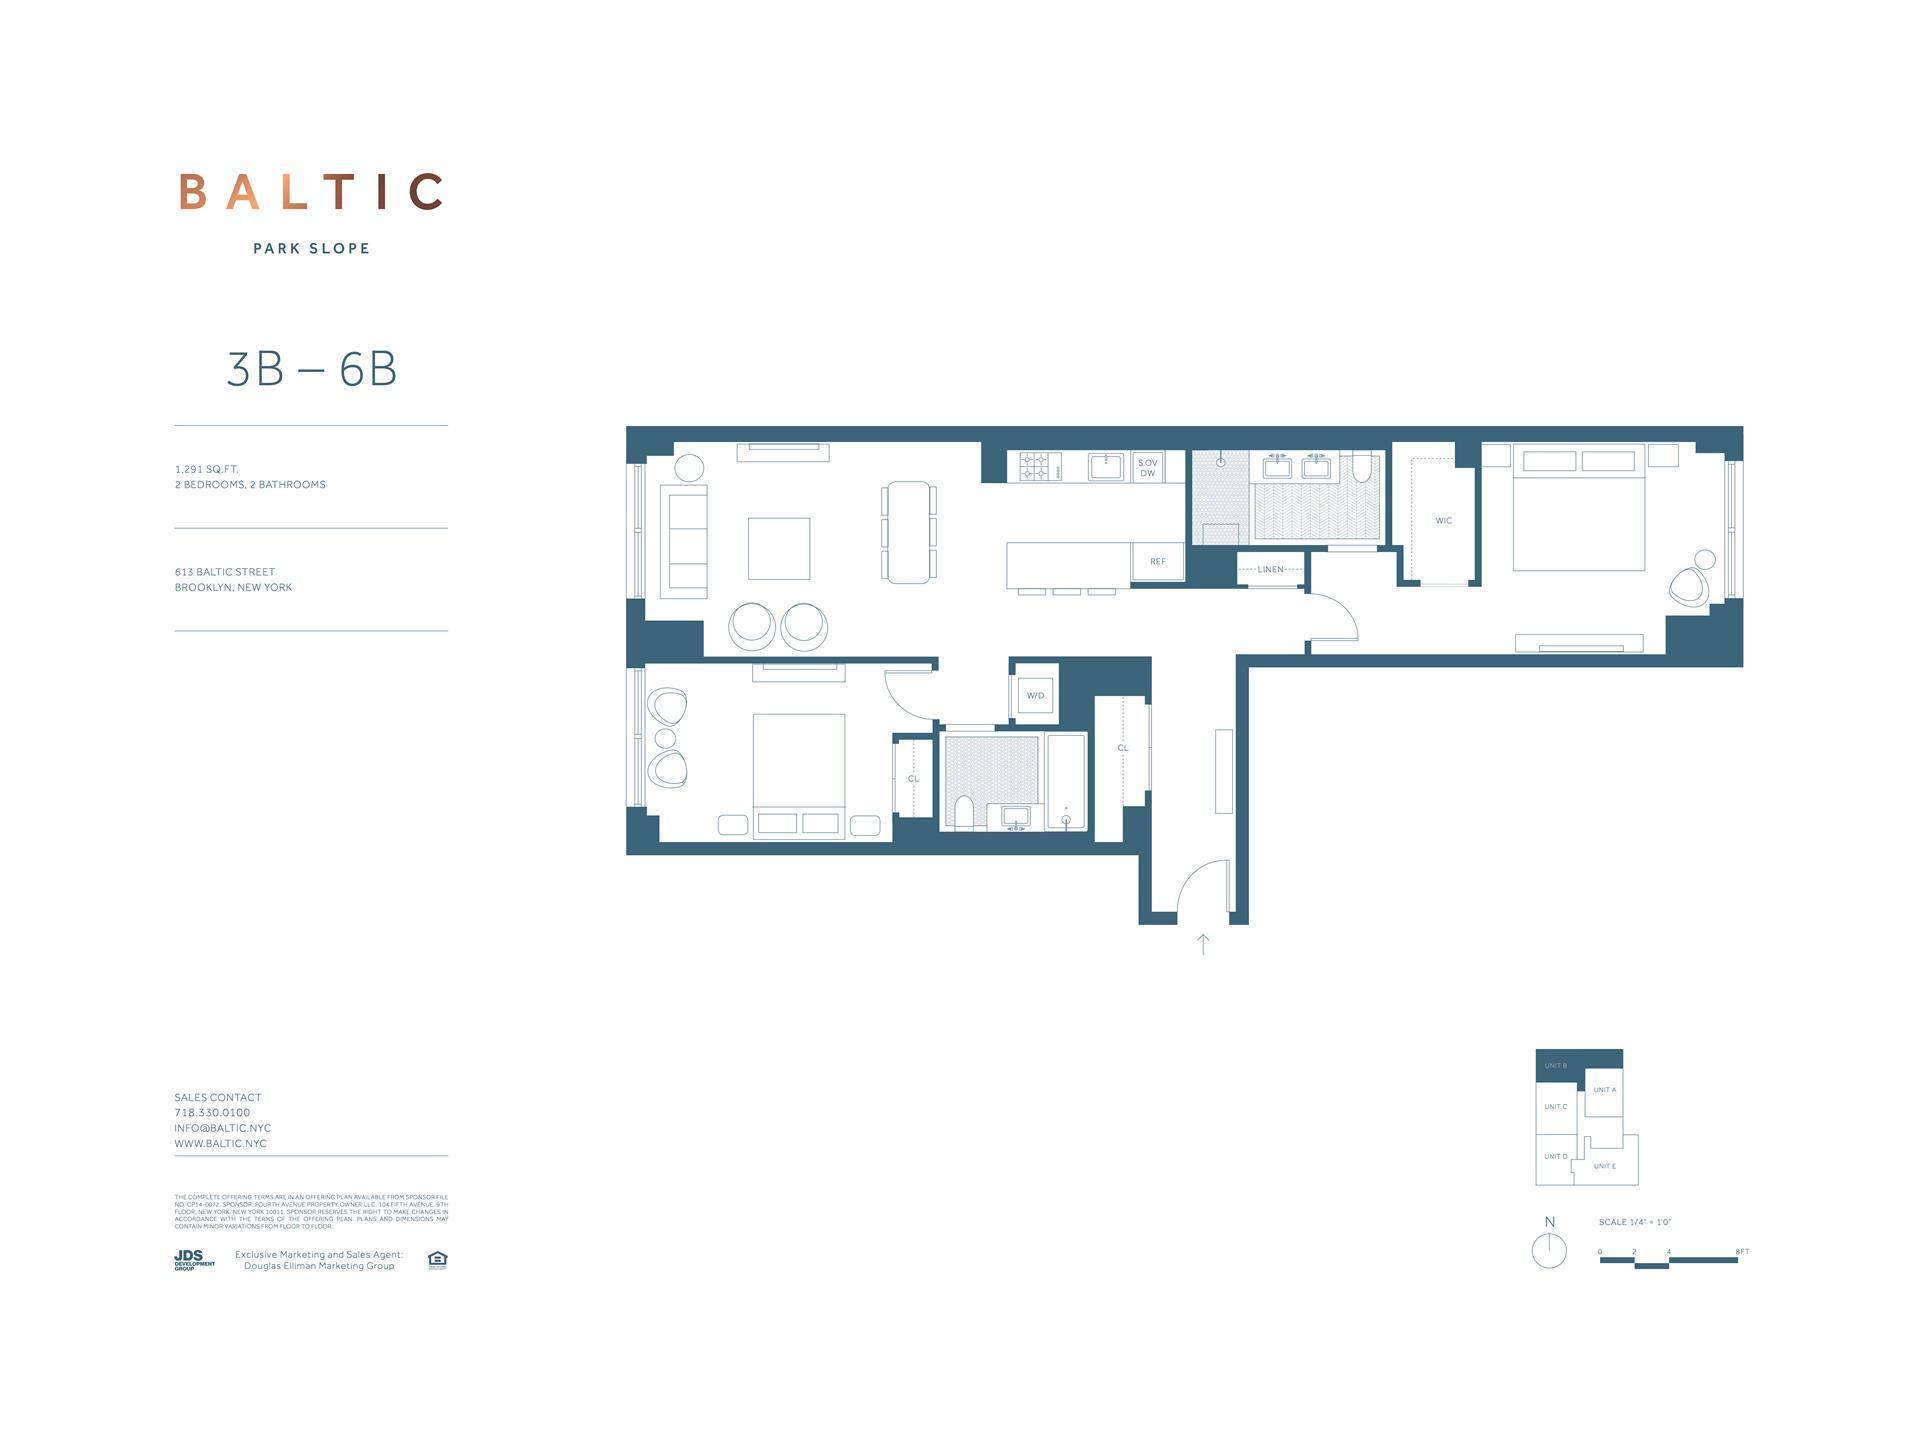 Floor plan of 613 Baltic St, 3B - Park Slope, New York